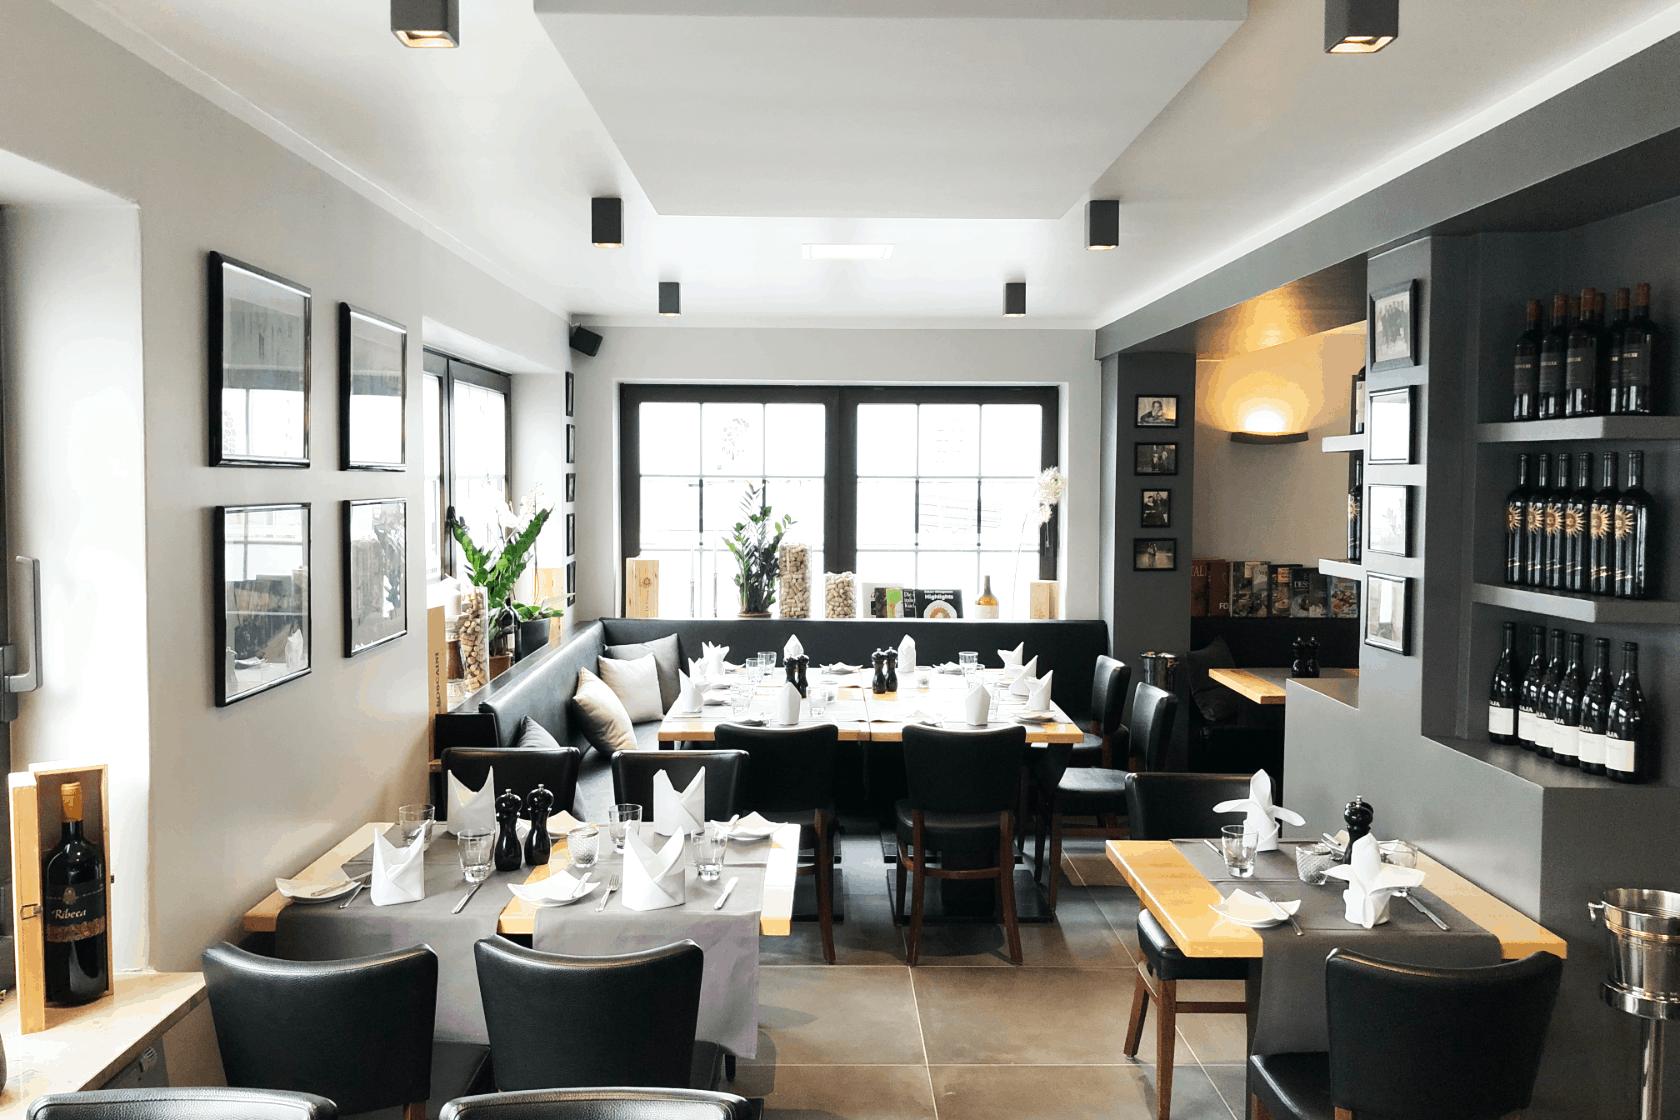 Absorber / vertikal / Deckenspiegel / Büro / Restaurant / Kantine